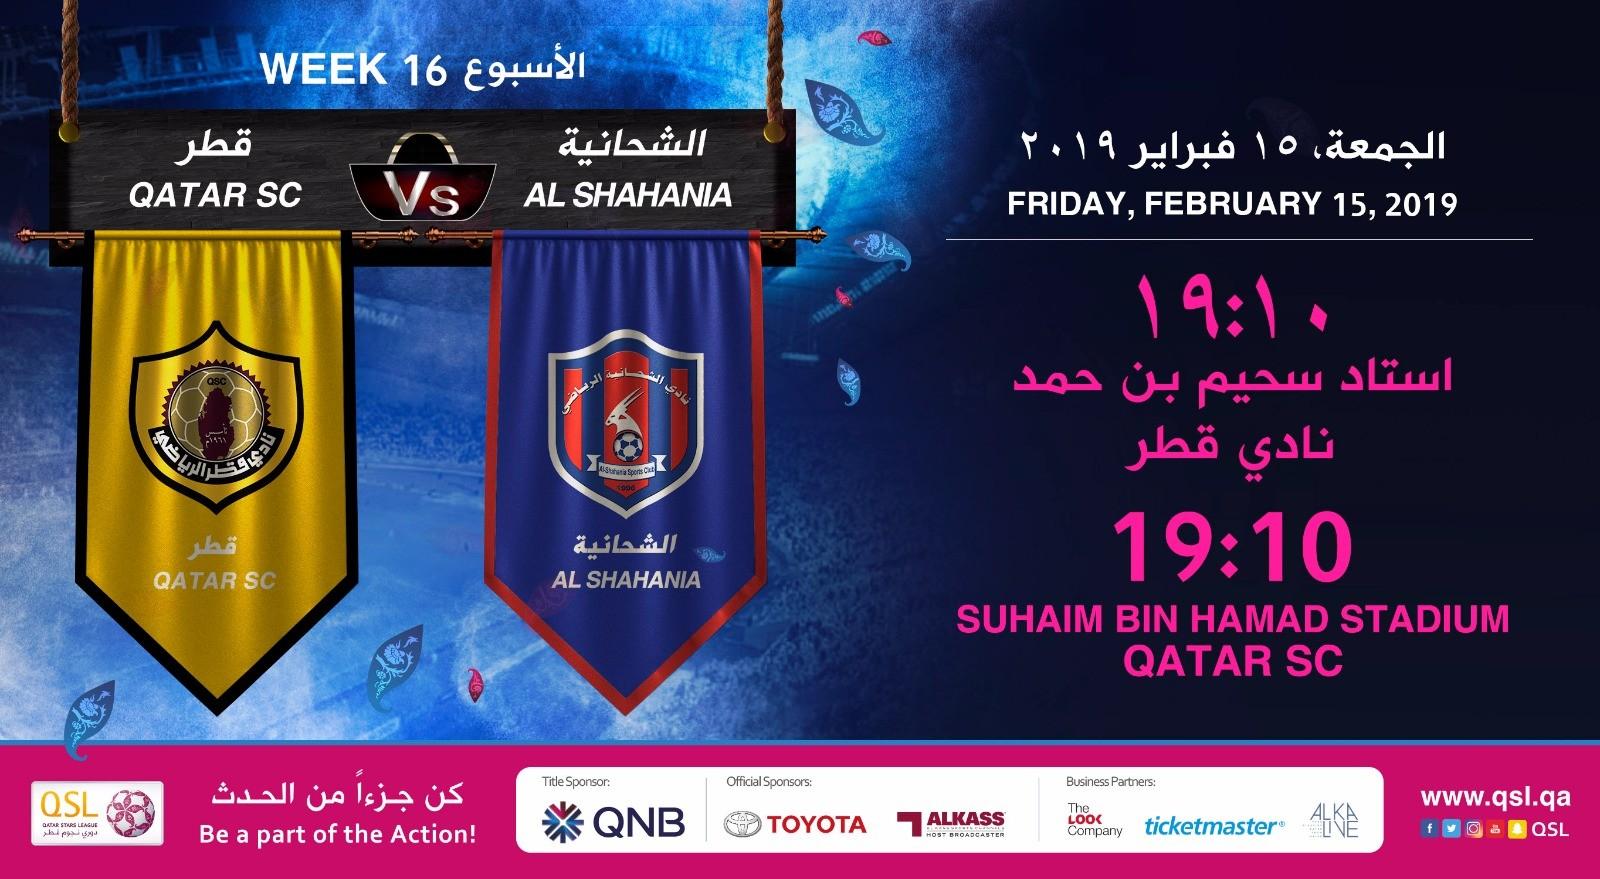 QNB Stars League Week 16 — Qatar SC vs Al Shahania